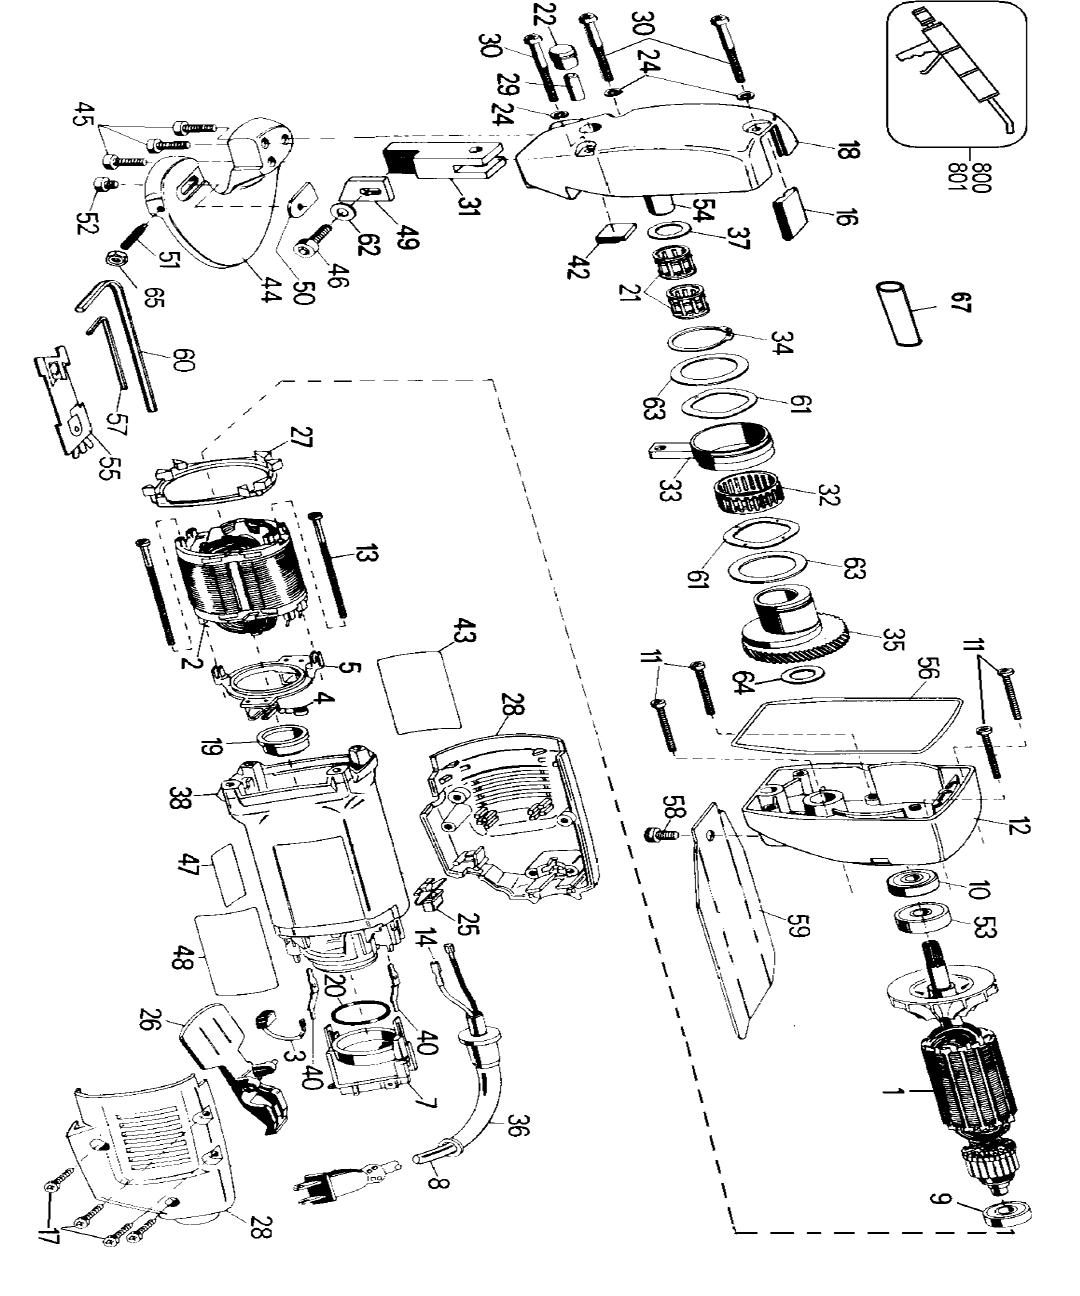 Dewalt Dw892 Type 3 Parts List